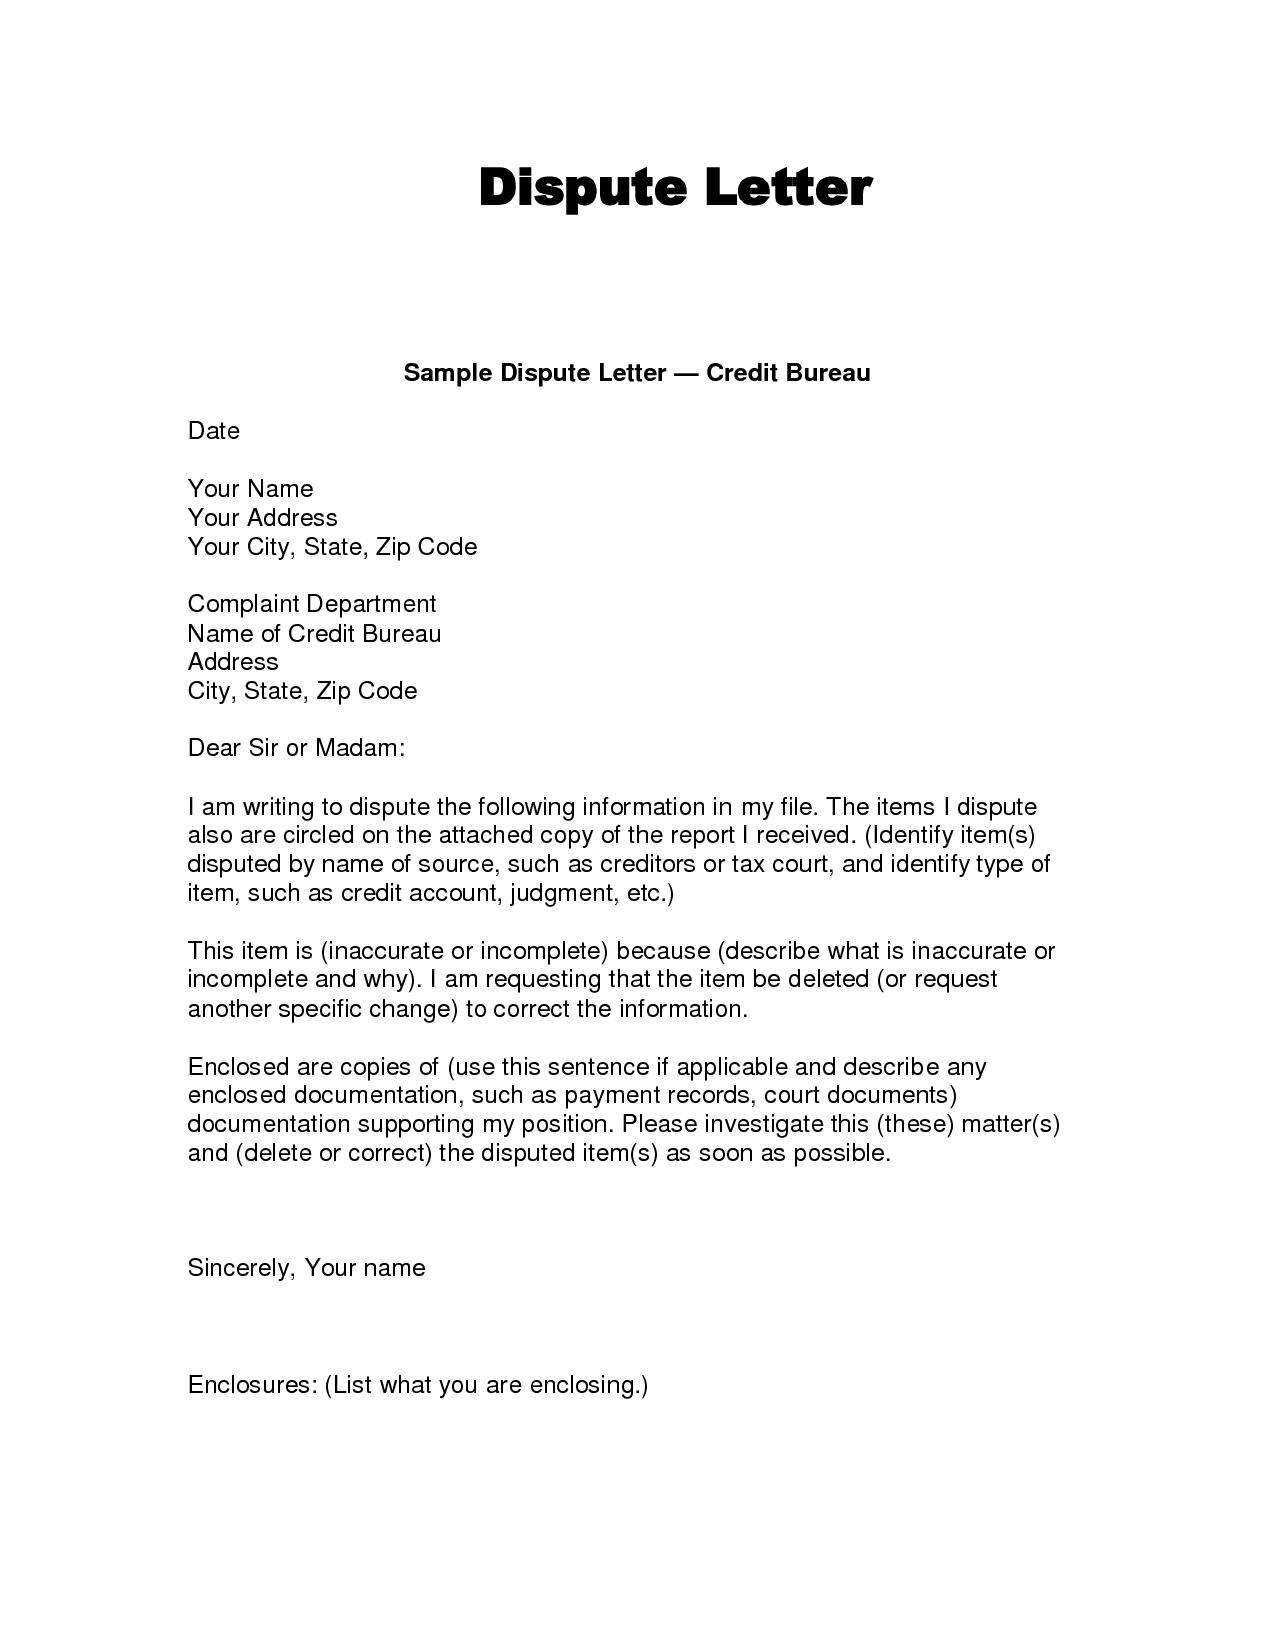 Dispute credit report sample letter inviview writing dispute letter format 2018 goals to do sample credit report spiritdancerdesigns Gallery